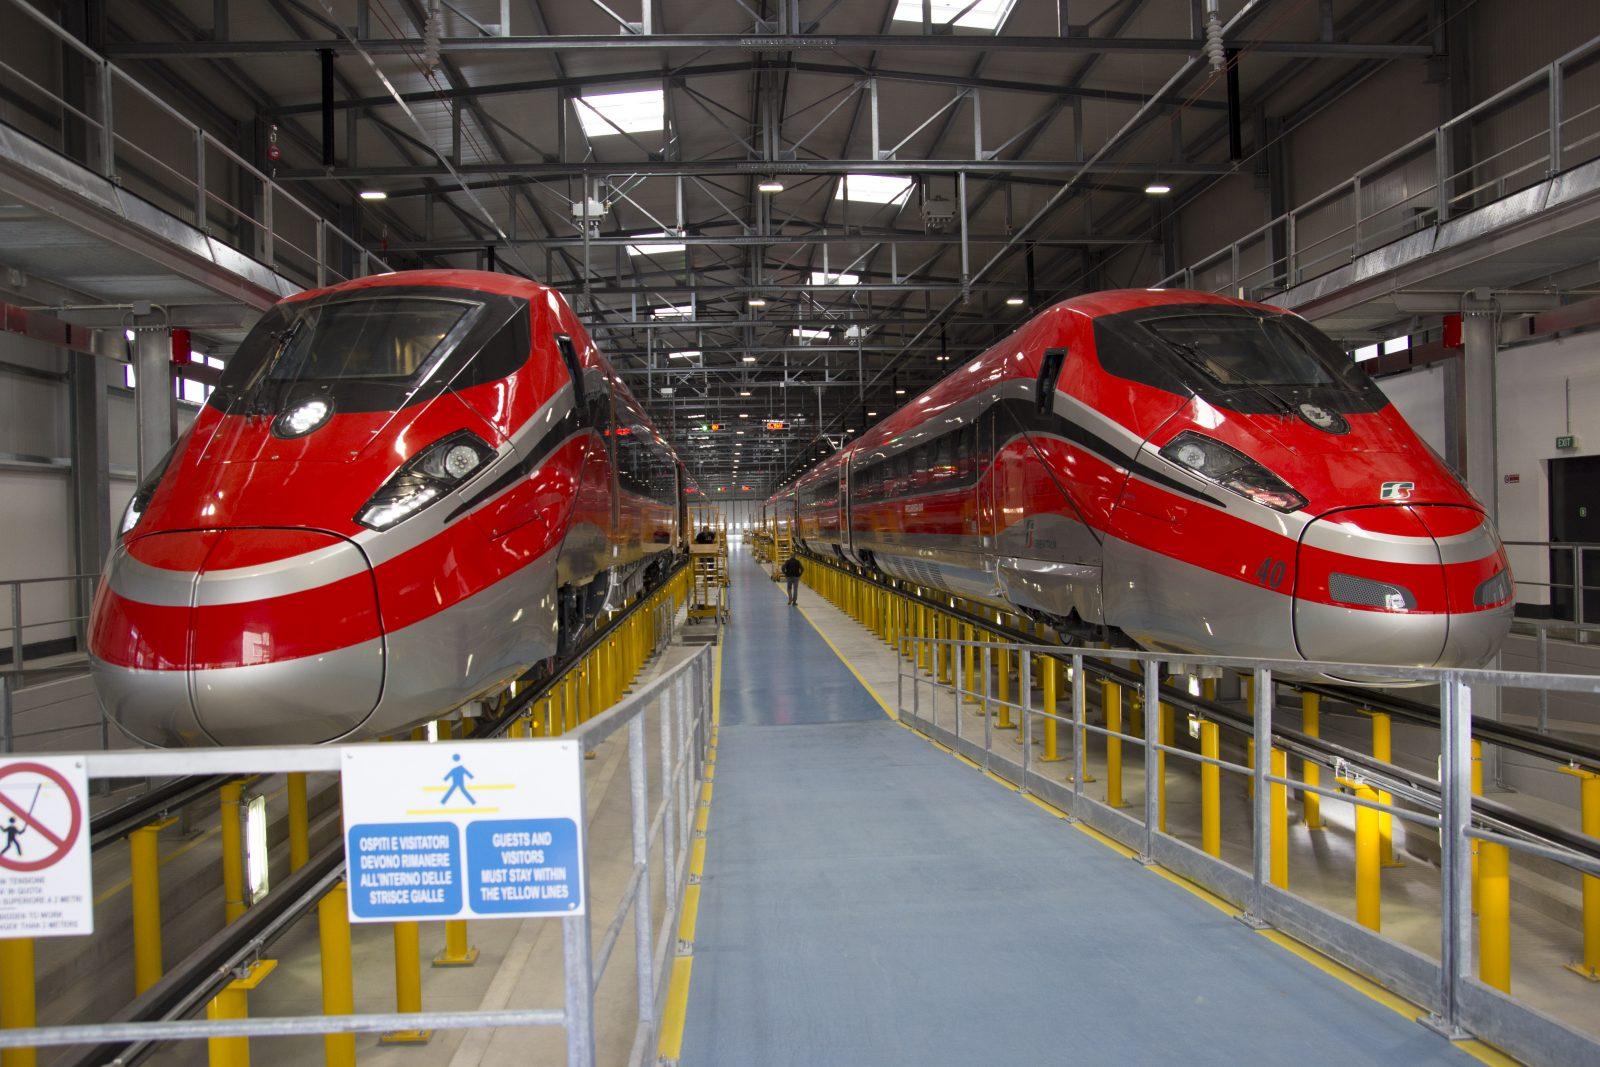 [IT] More Frecciarossa 1000 High Speed Trains For